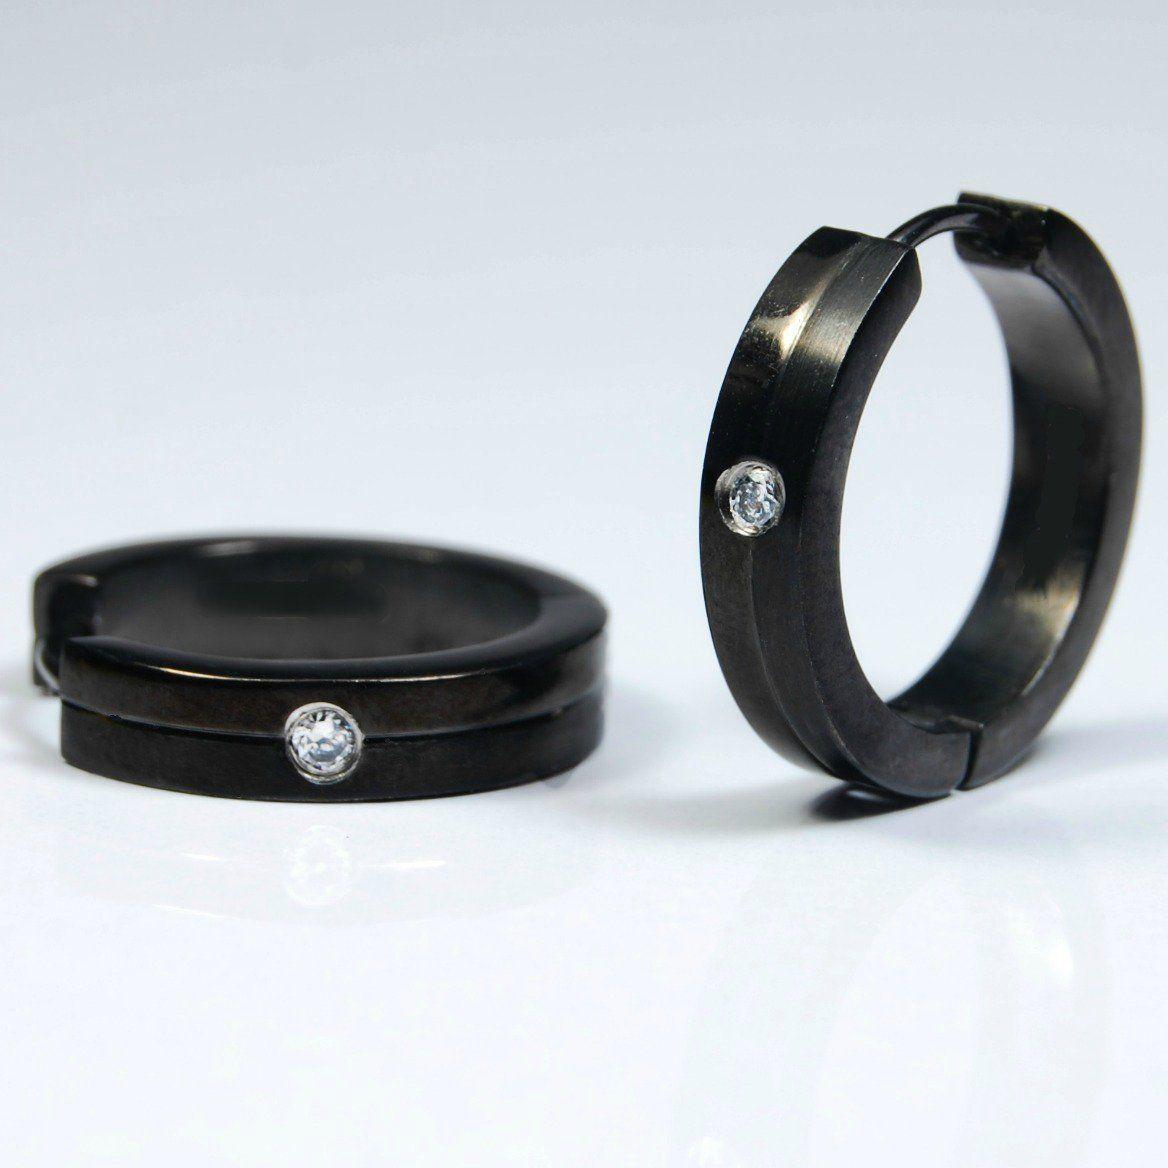 7767790c1d0d3 Men's hoop earrings, extra large black stainless steel hoops with cz ...